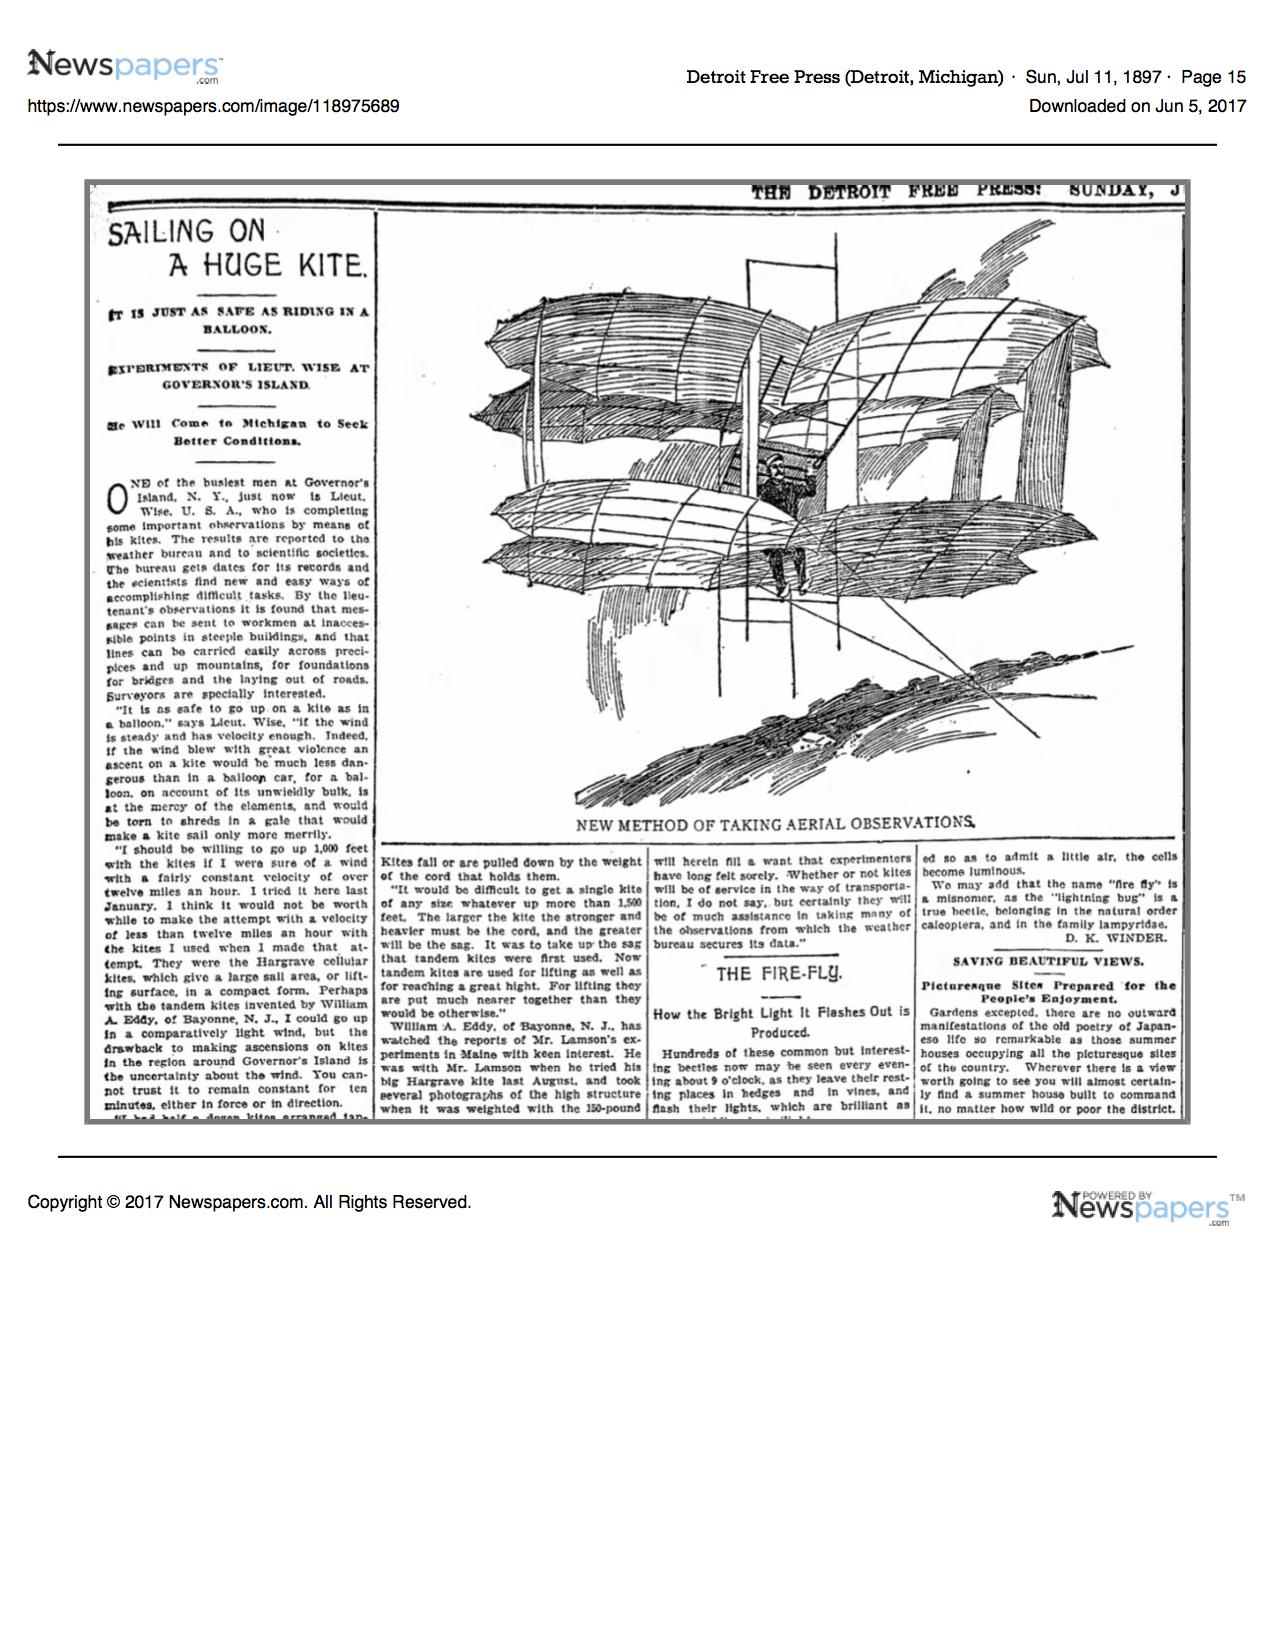 Detroit_Free_Press_Sun__Jul_11__1897_.jpg